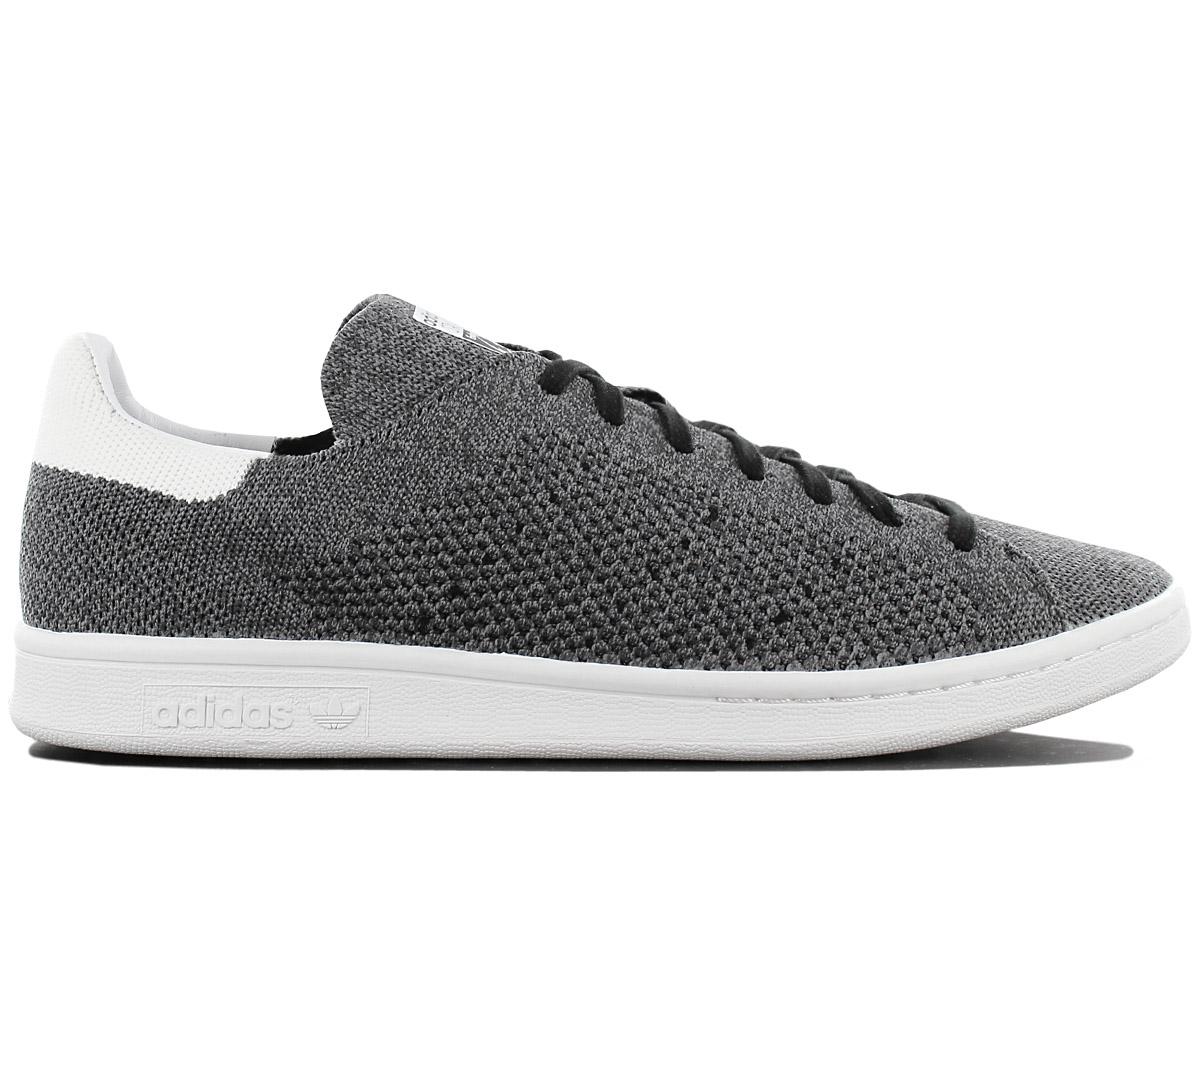 separation shoes 5e7b5 4e8cd Adidas Originals Stan Smith Pk Primeknit Men s Sneakers Shoes Grey ...